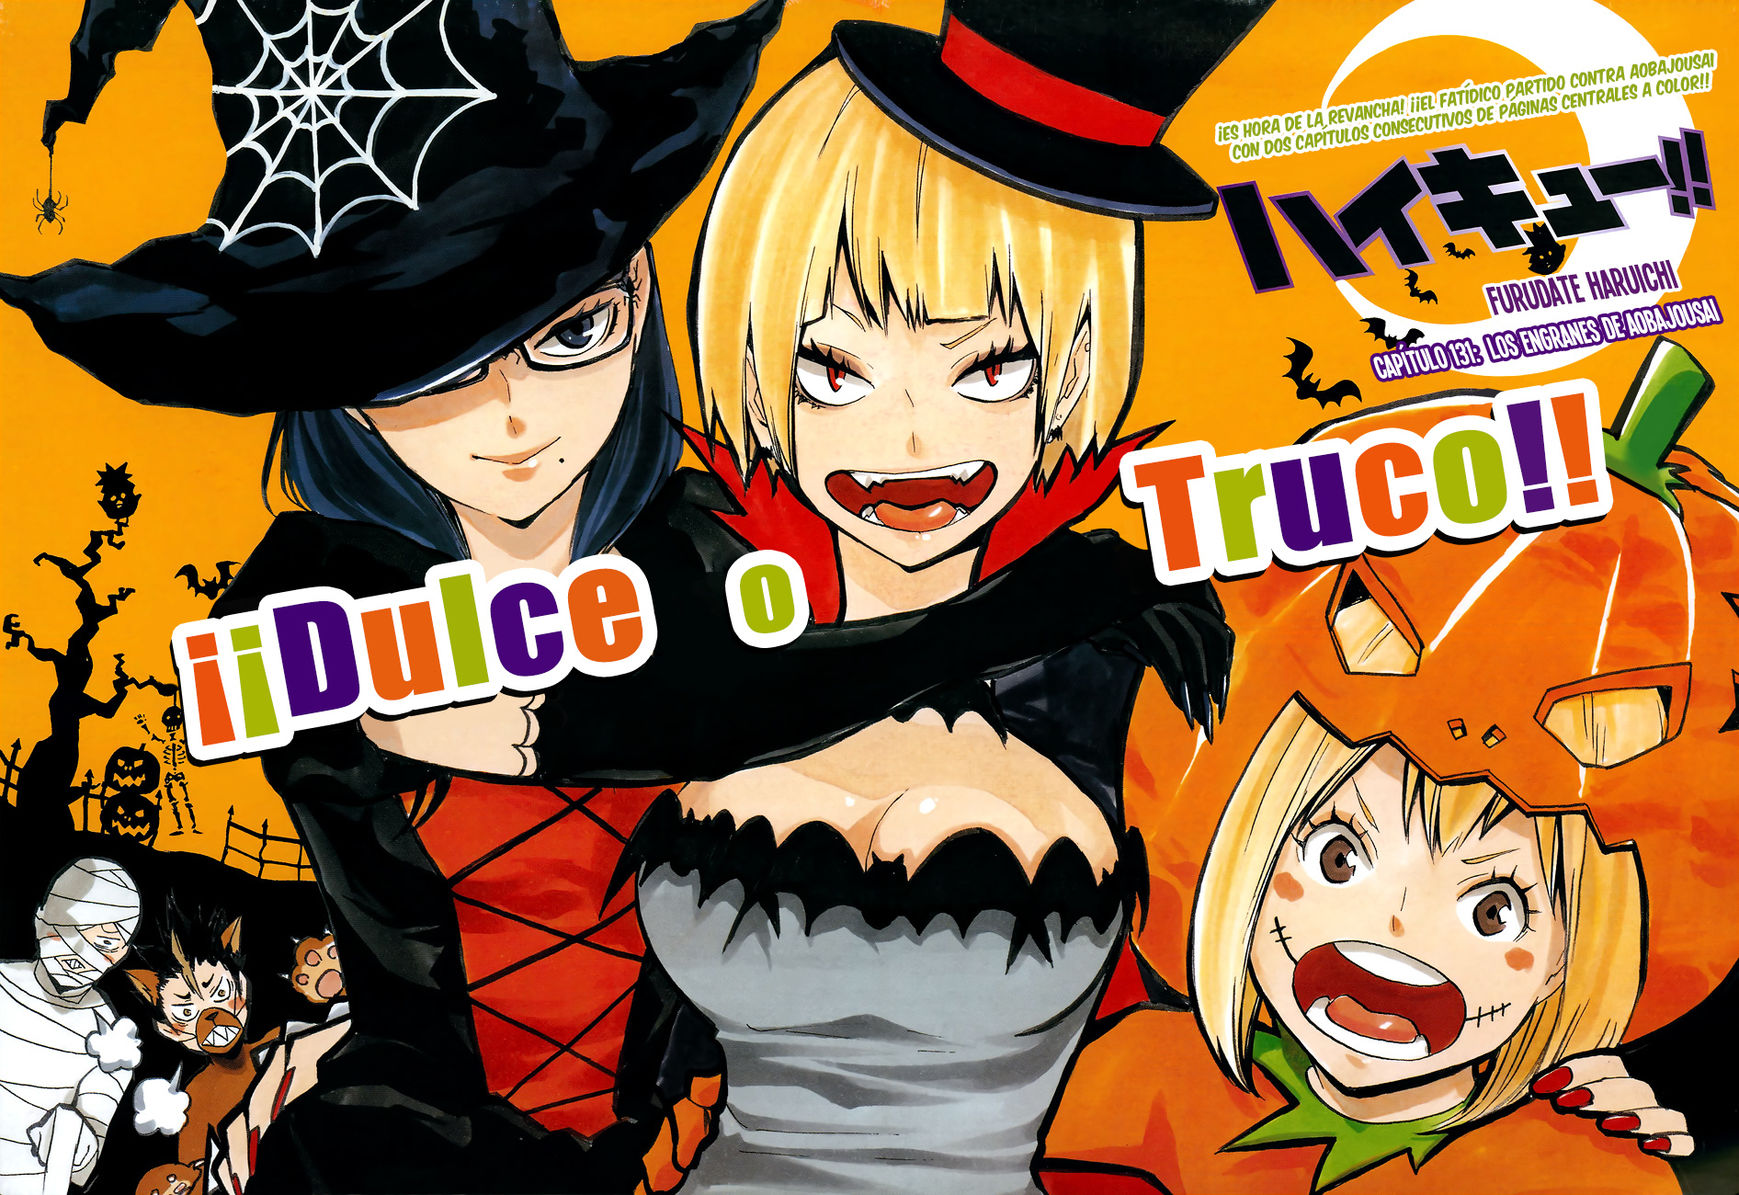 https://c5.ninemanga.com/es_manga/10/10/190168/5fa165118522de3e081998382065dda3.jpg Page 2